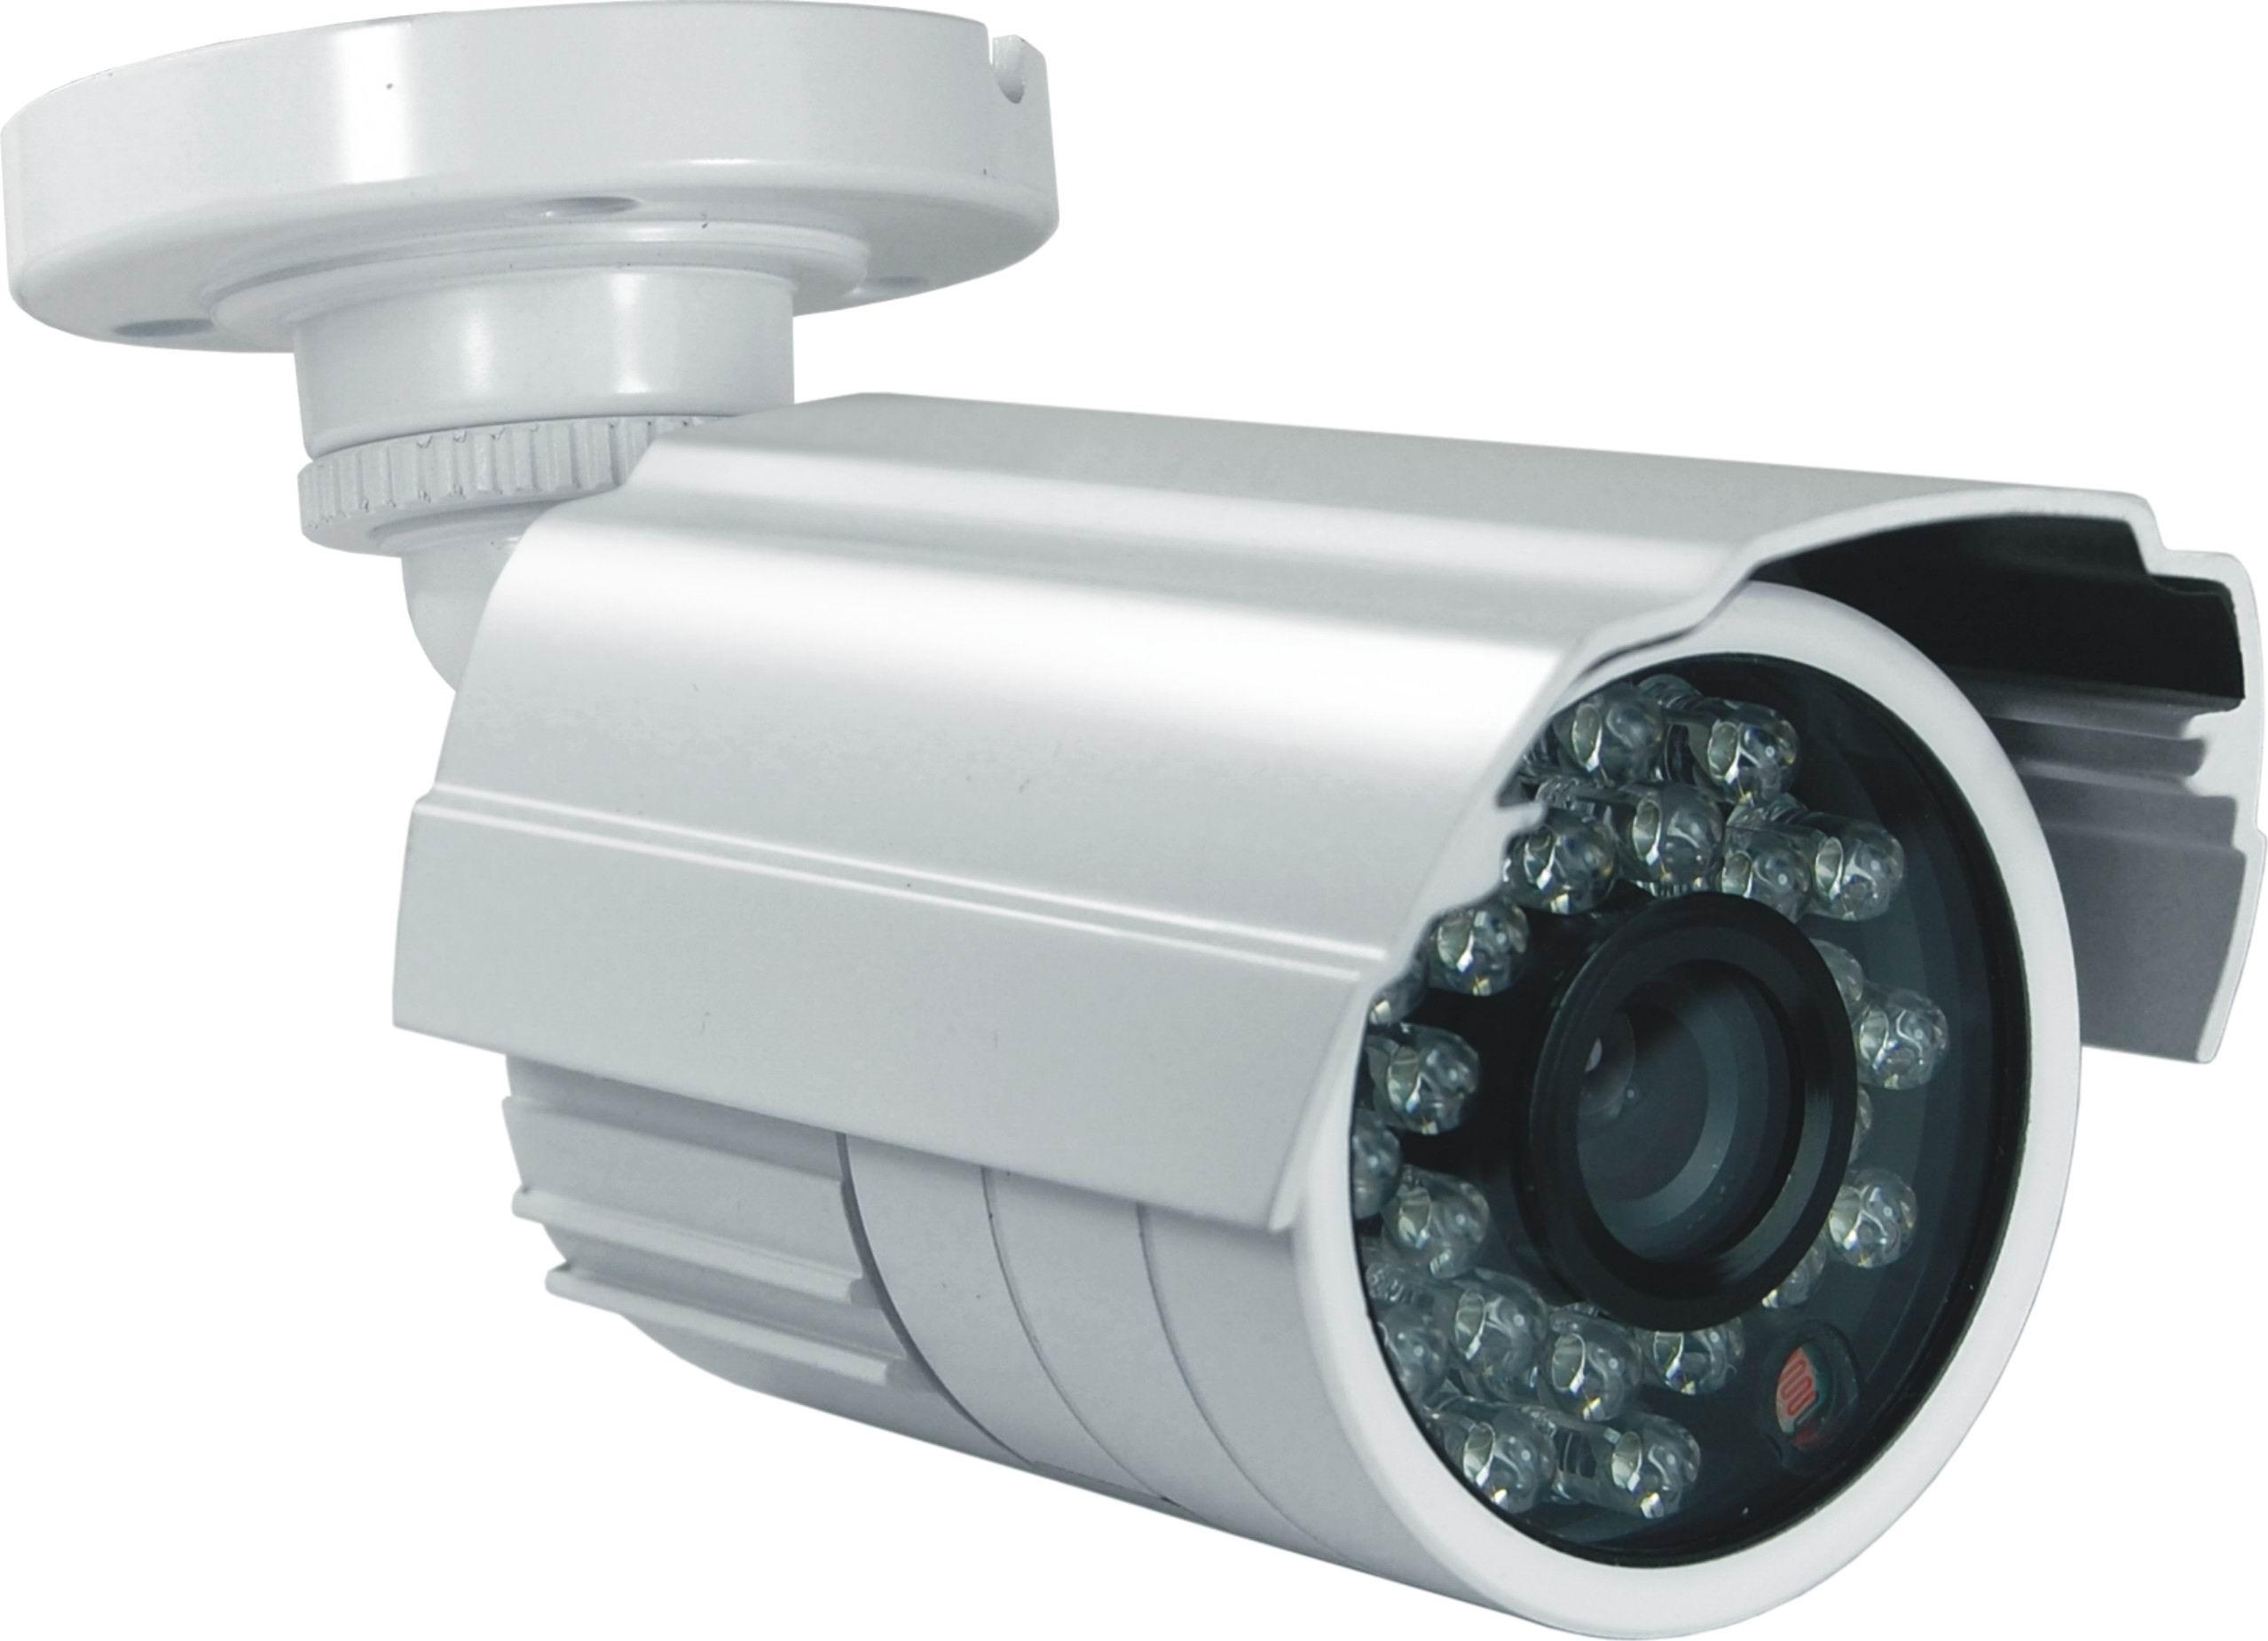 Cctv Camera 121